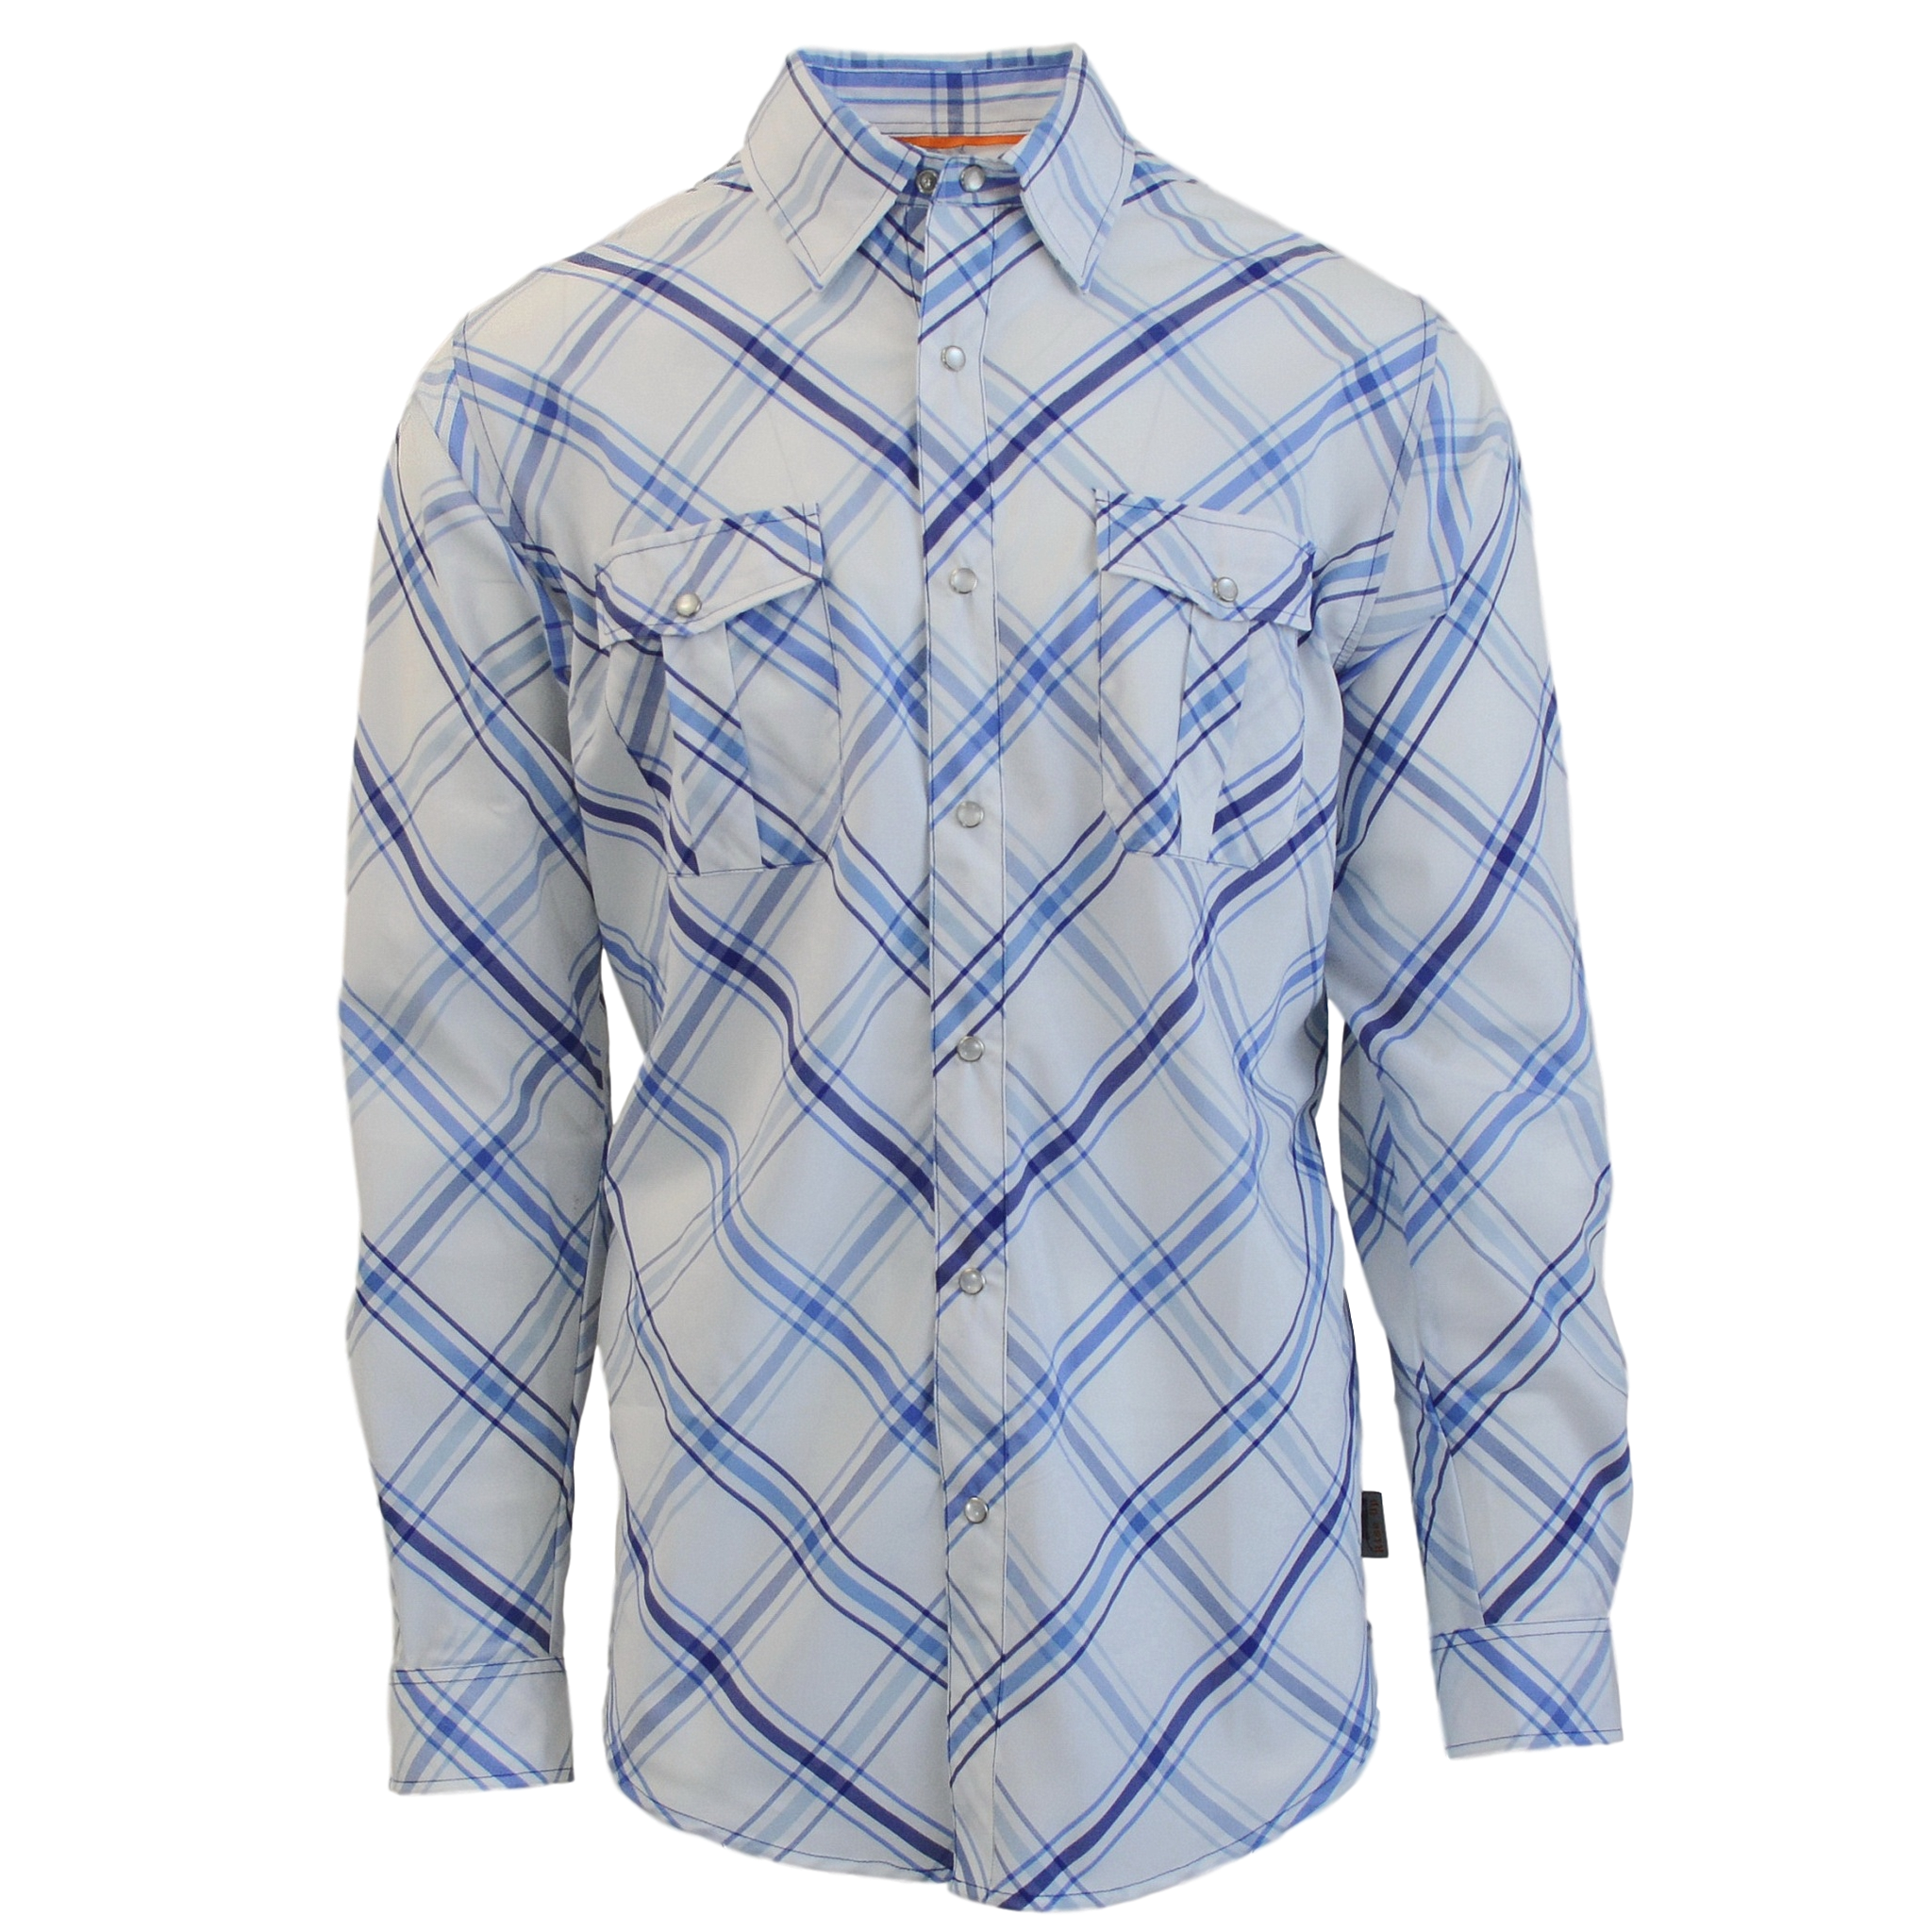 Fly Fishing Snap Button Shirt: Dagon Permit